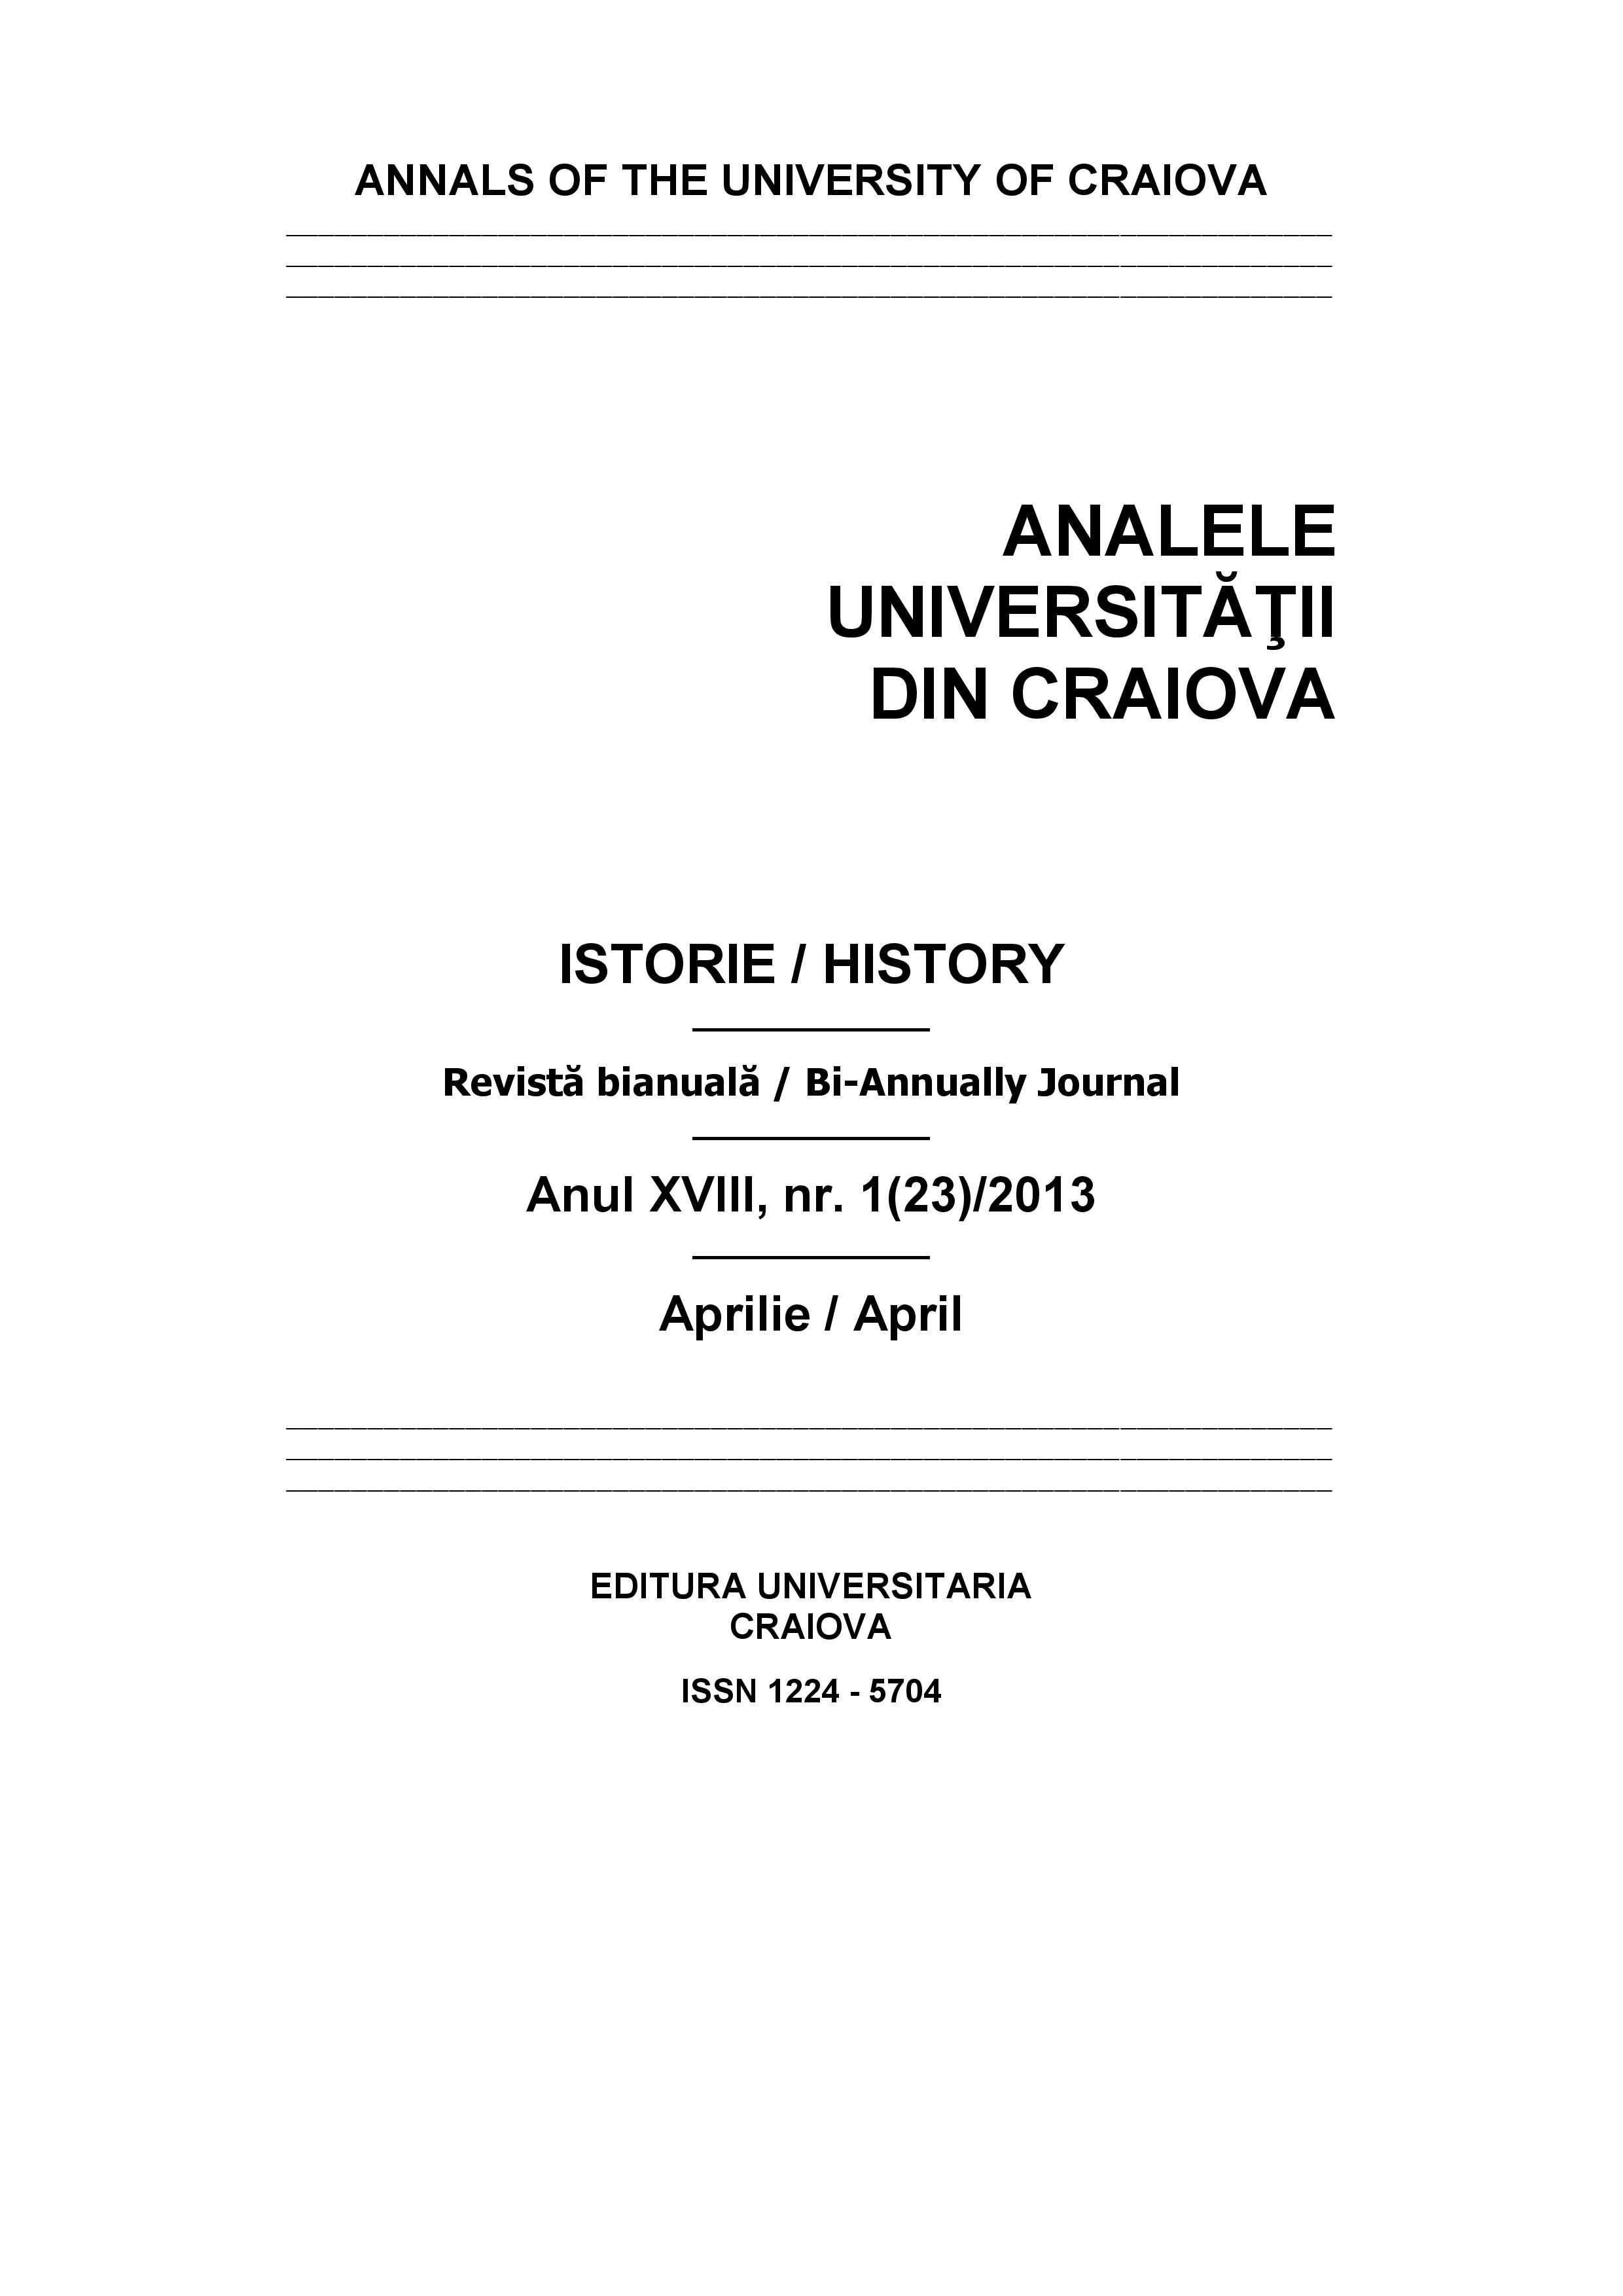 ANALE ISTORIE 2013_1_COPERTA PDF-page-001